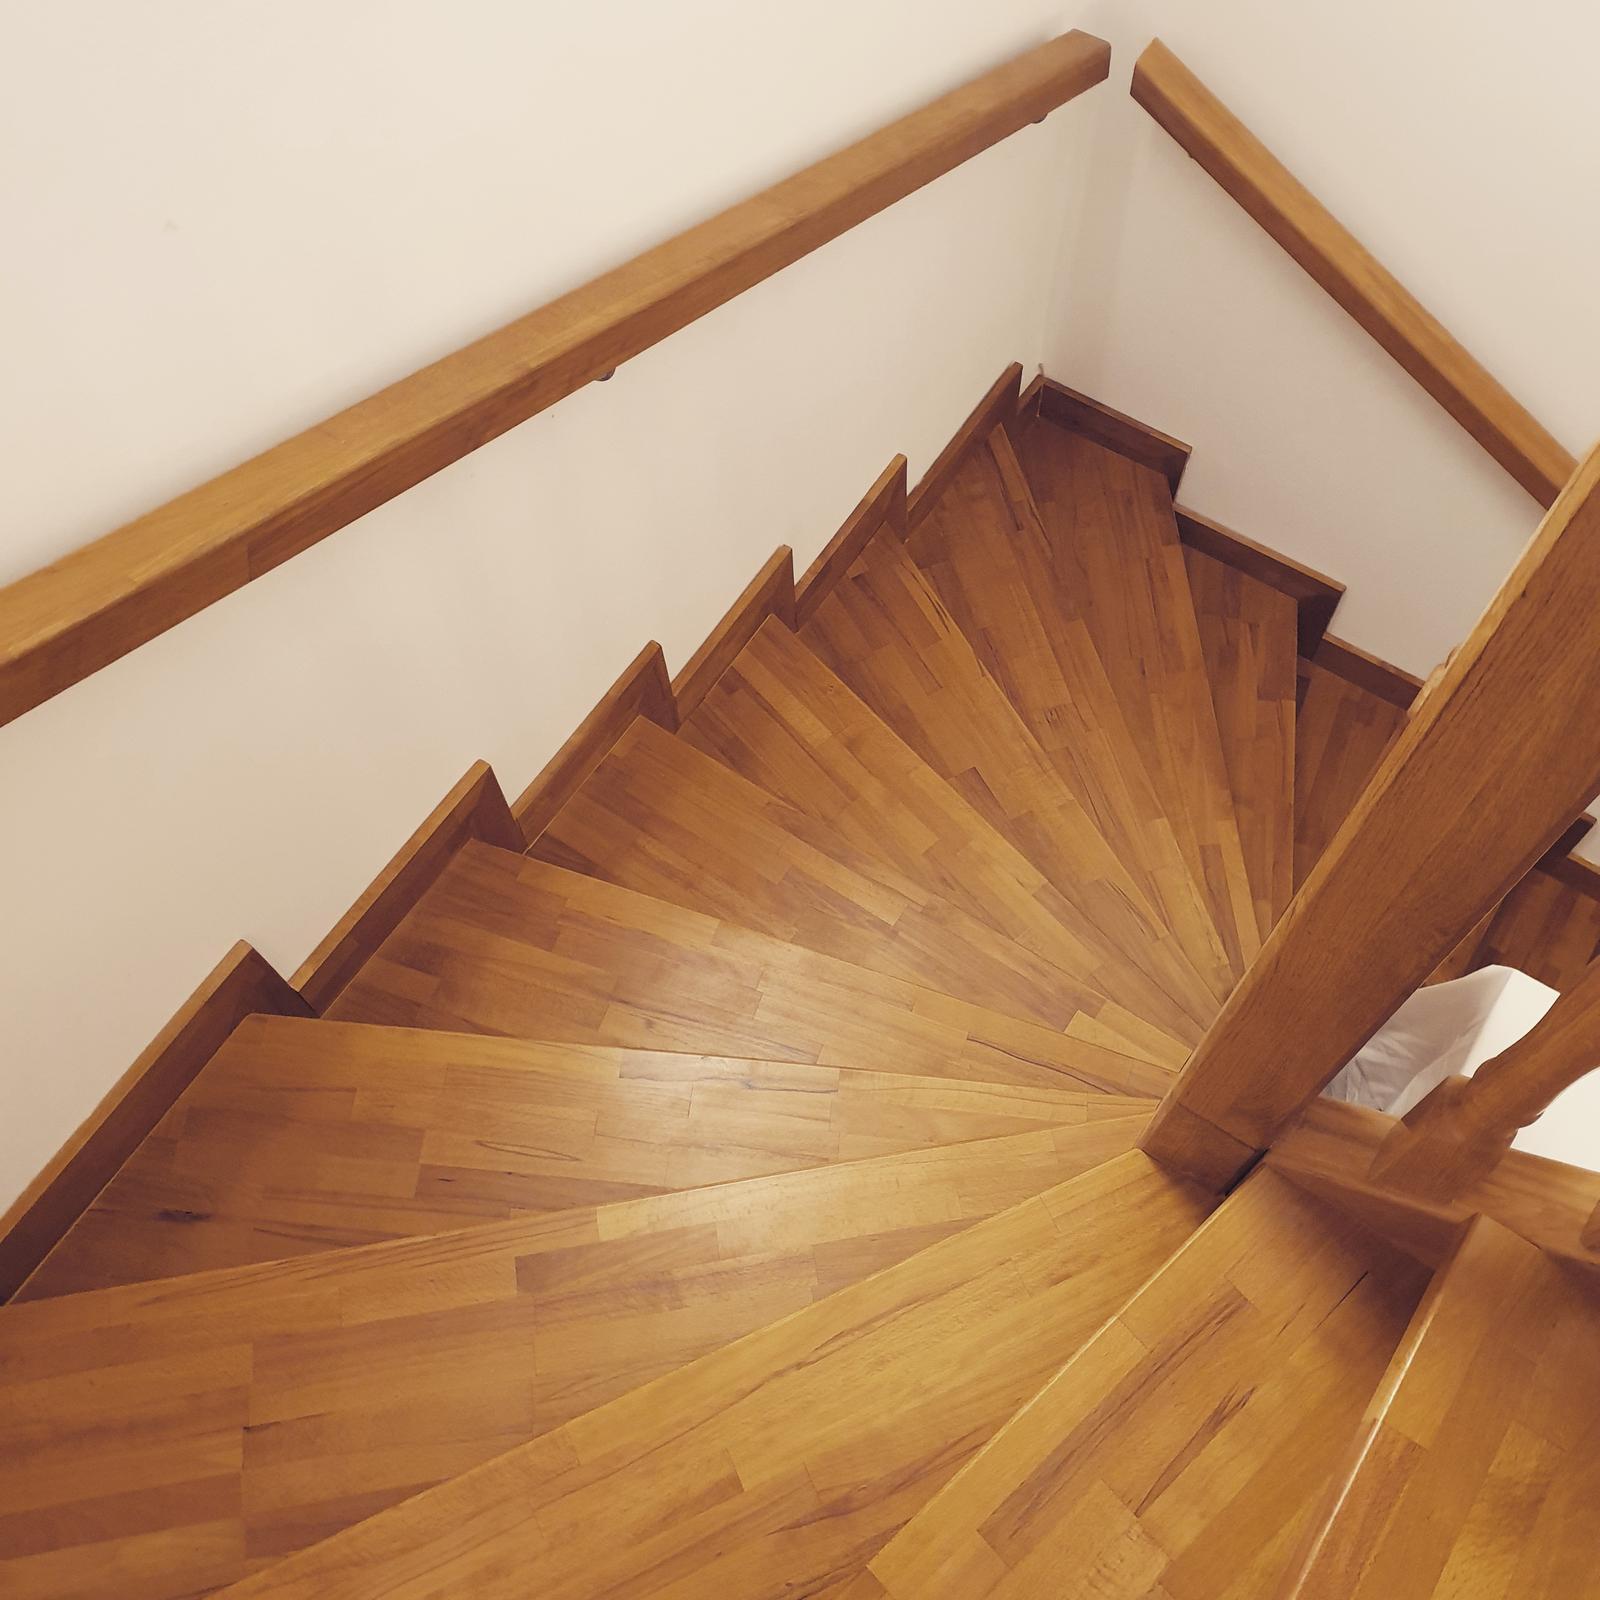 Konzolové schody - BUK, DUB - Obrázok č. 31